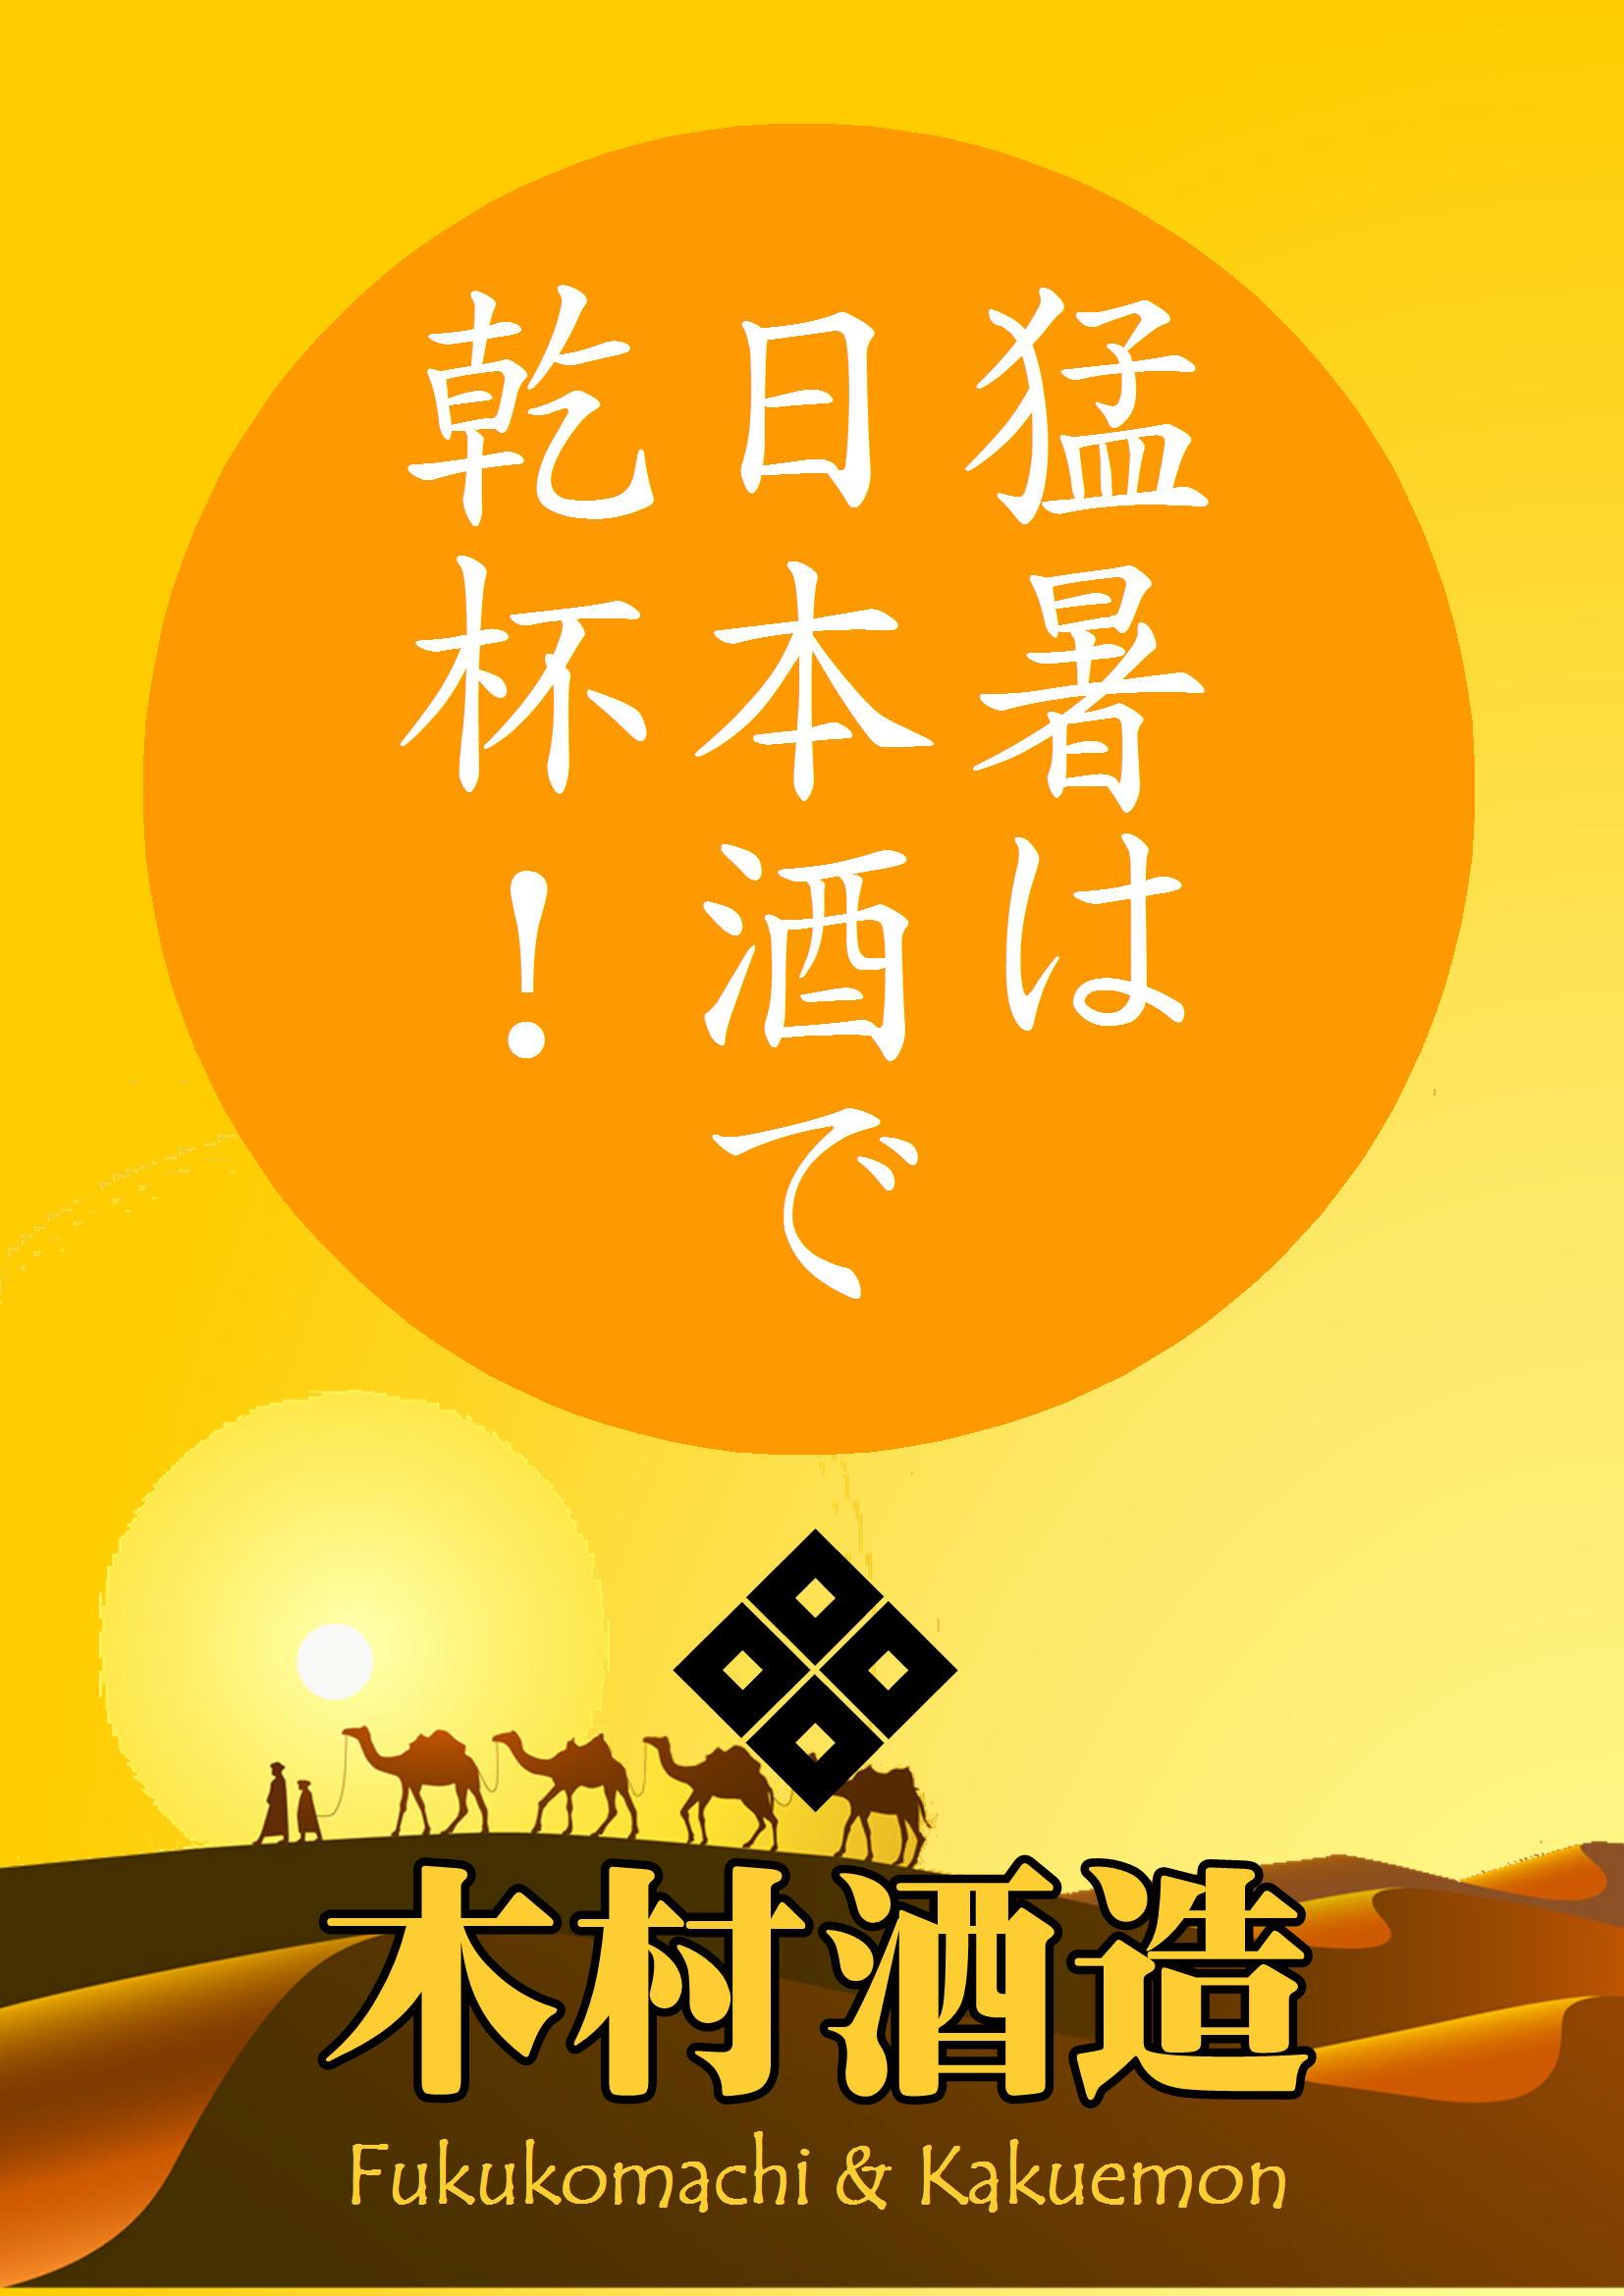 http://www.fukukomachi.com/blog/photo/20170809-2.JPG